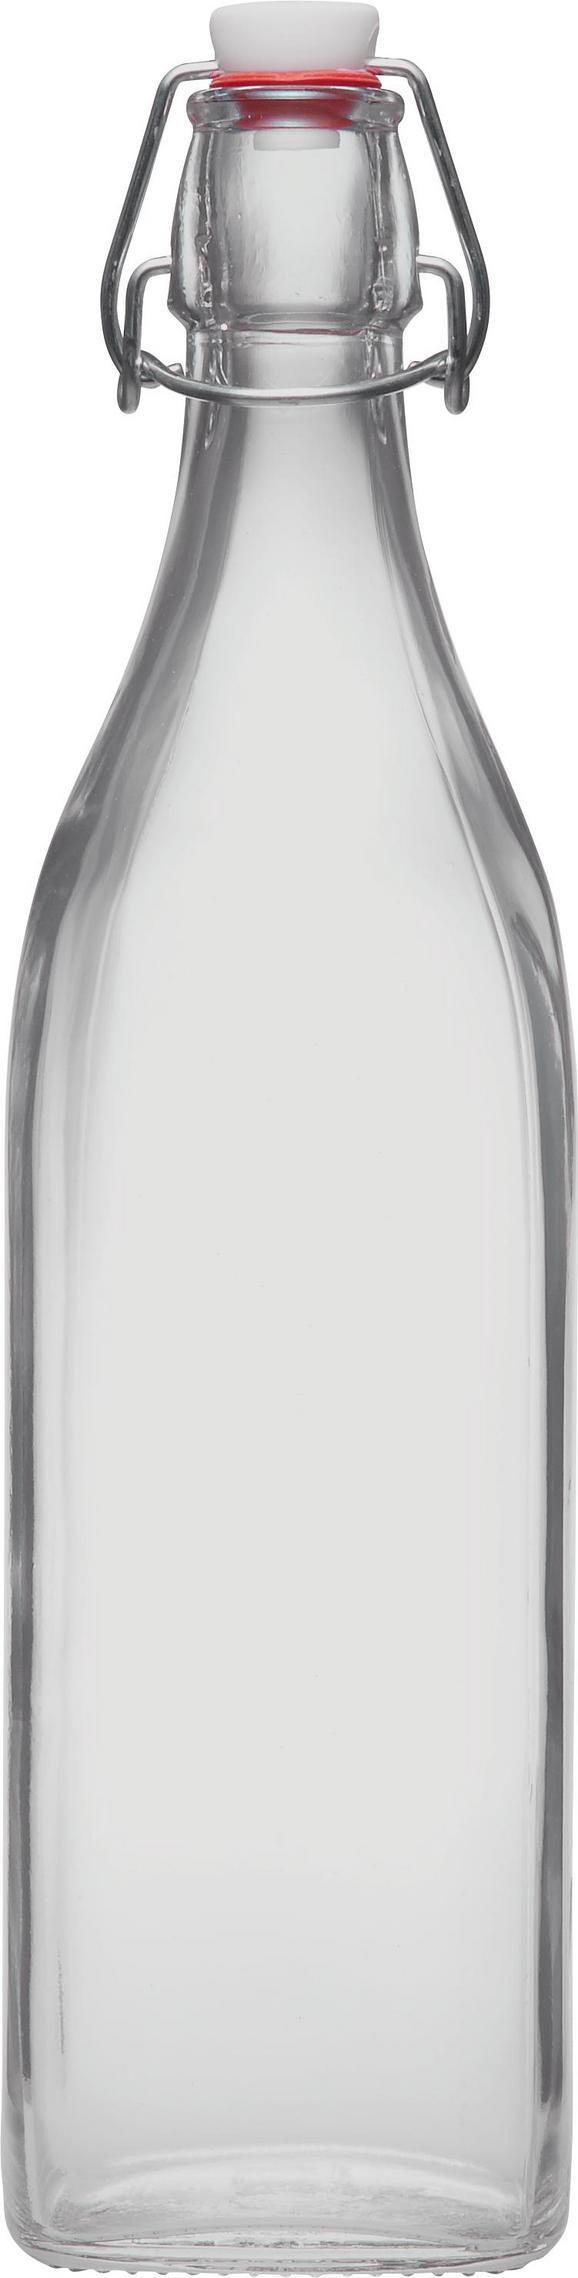 Universalflasche Swing aus Glas, ca. 1l - Klar, Glas (1l) - Mömax modern living